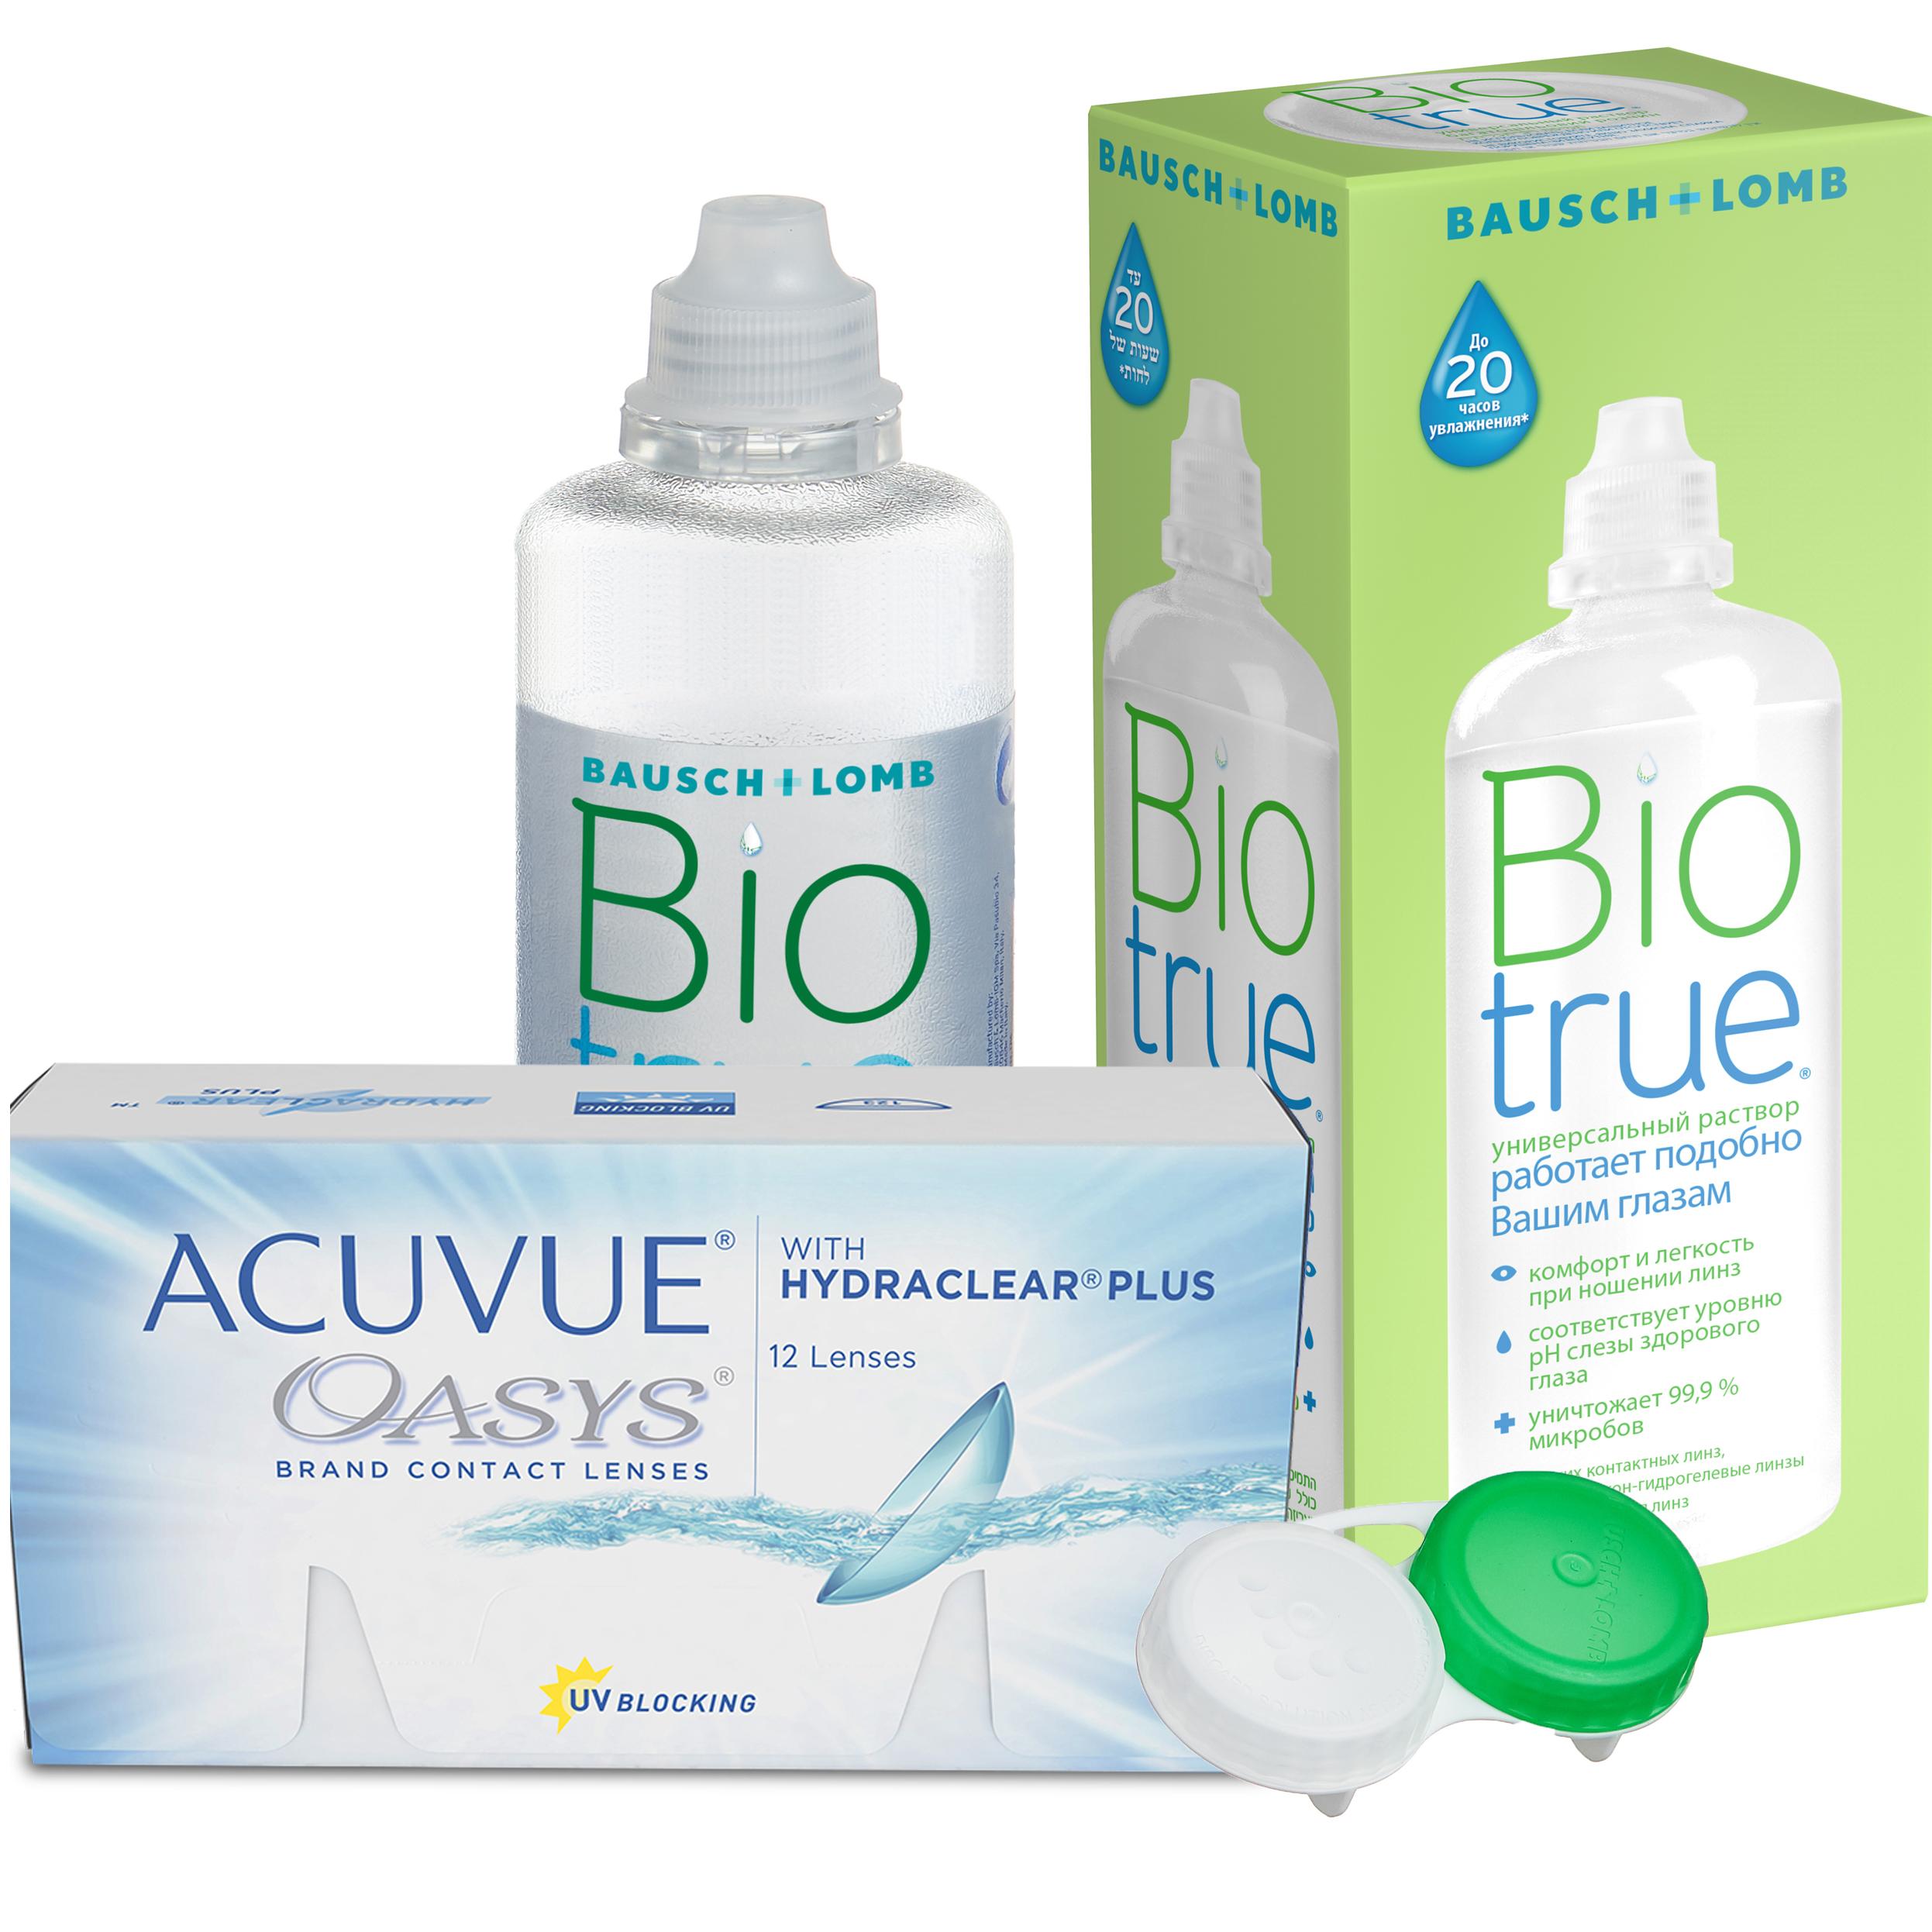 Купить Oasys with Hydraclear Plus 12 линз + Biotrue, Контактные линзы Acuvue Oasys with Hydraclear Plus 12 линз R 8.4 -4, 25 + Biotrue 300 мл